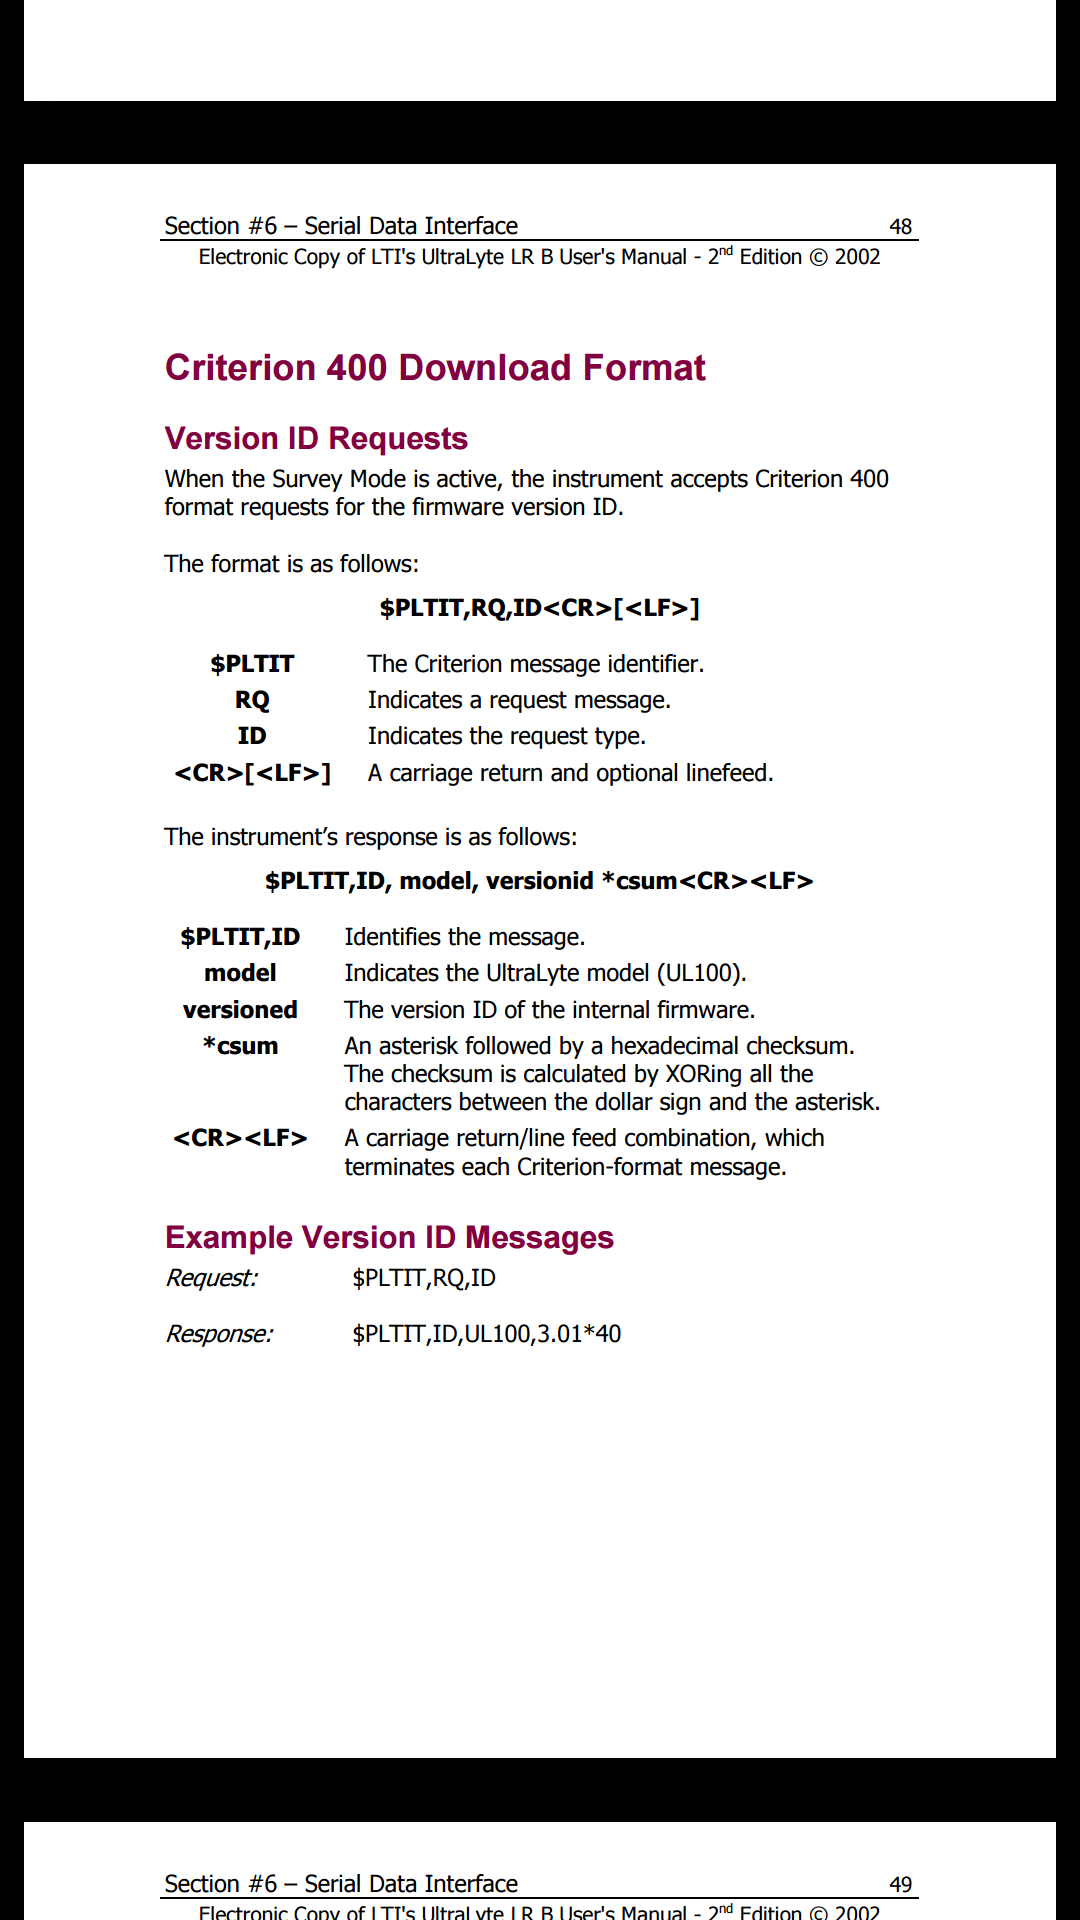 http://www.bentcop.biz/Screenshot_2017-04-11-23-22-19.png